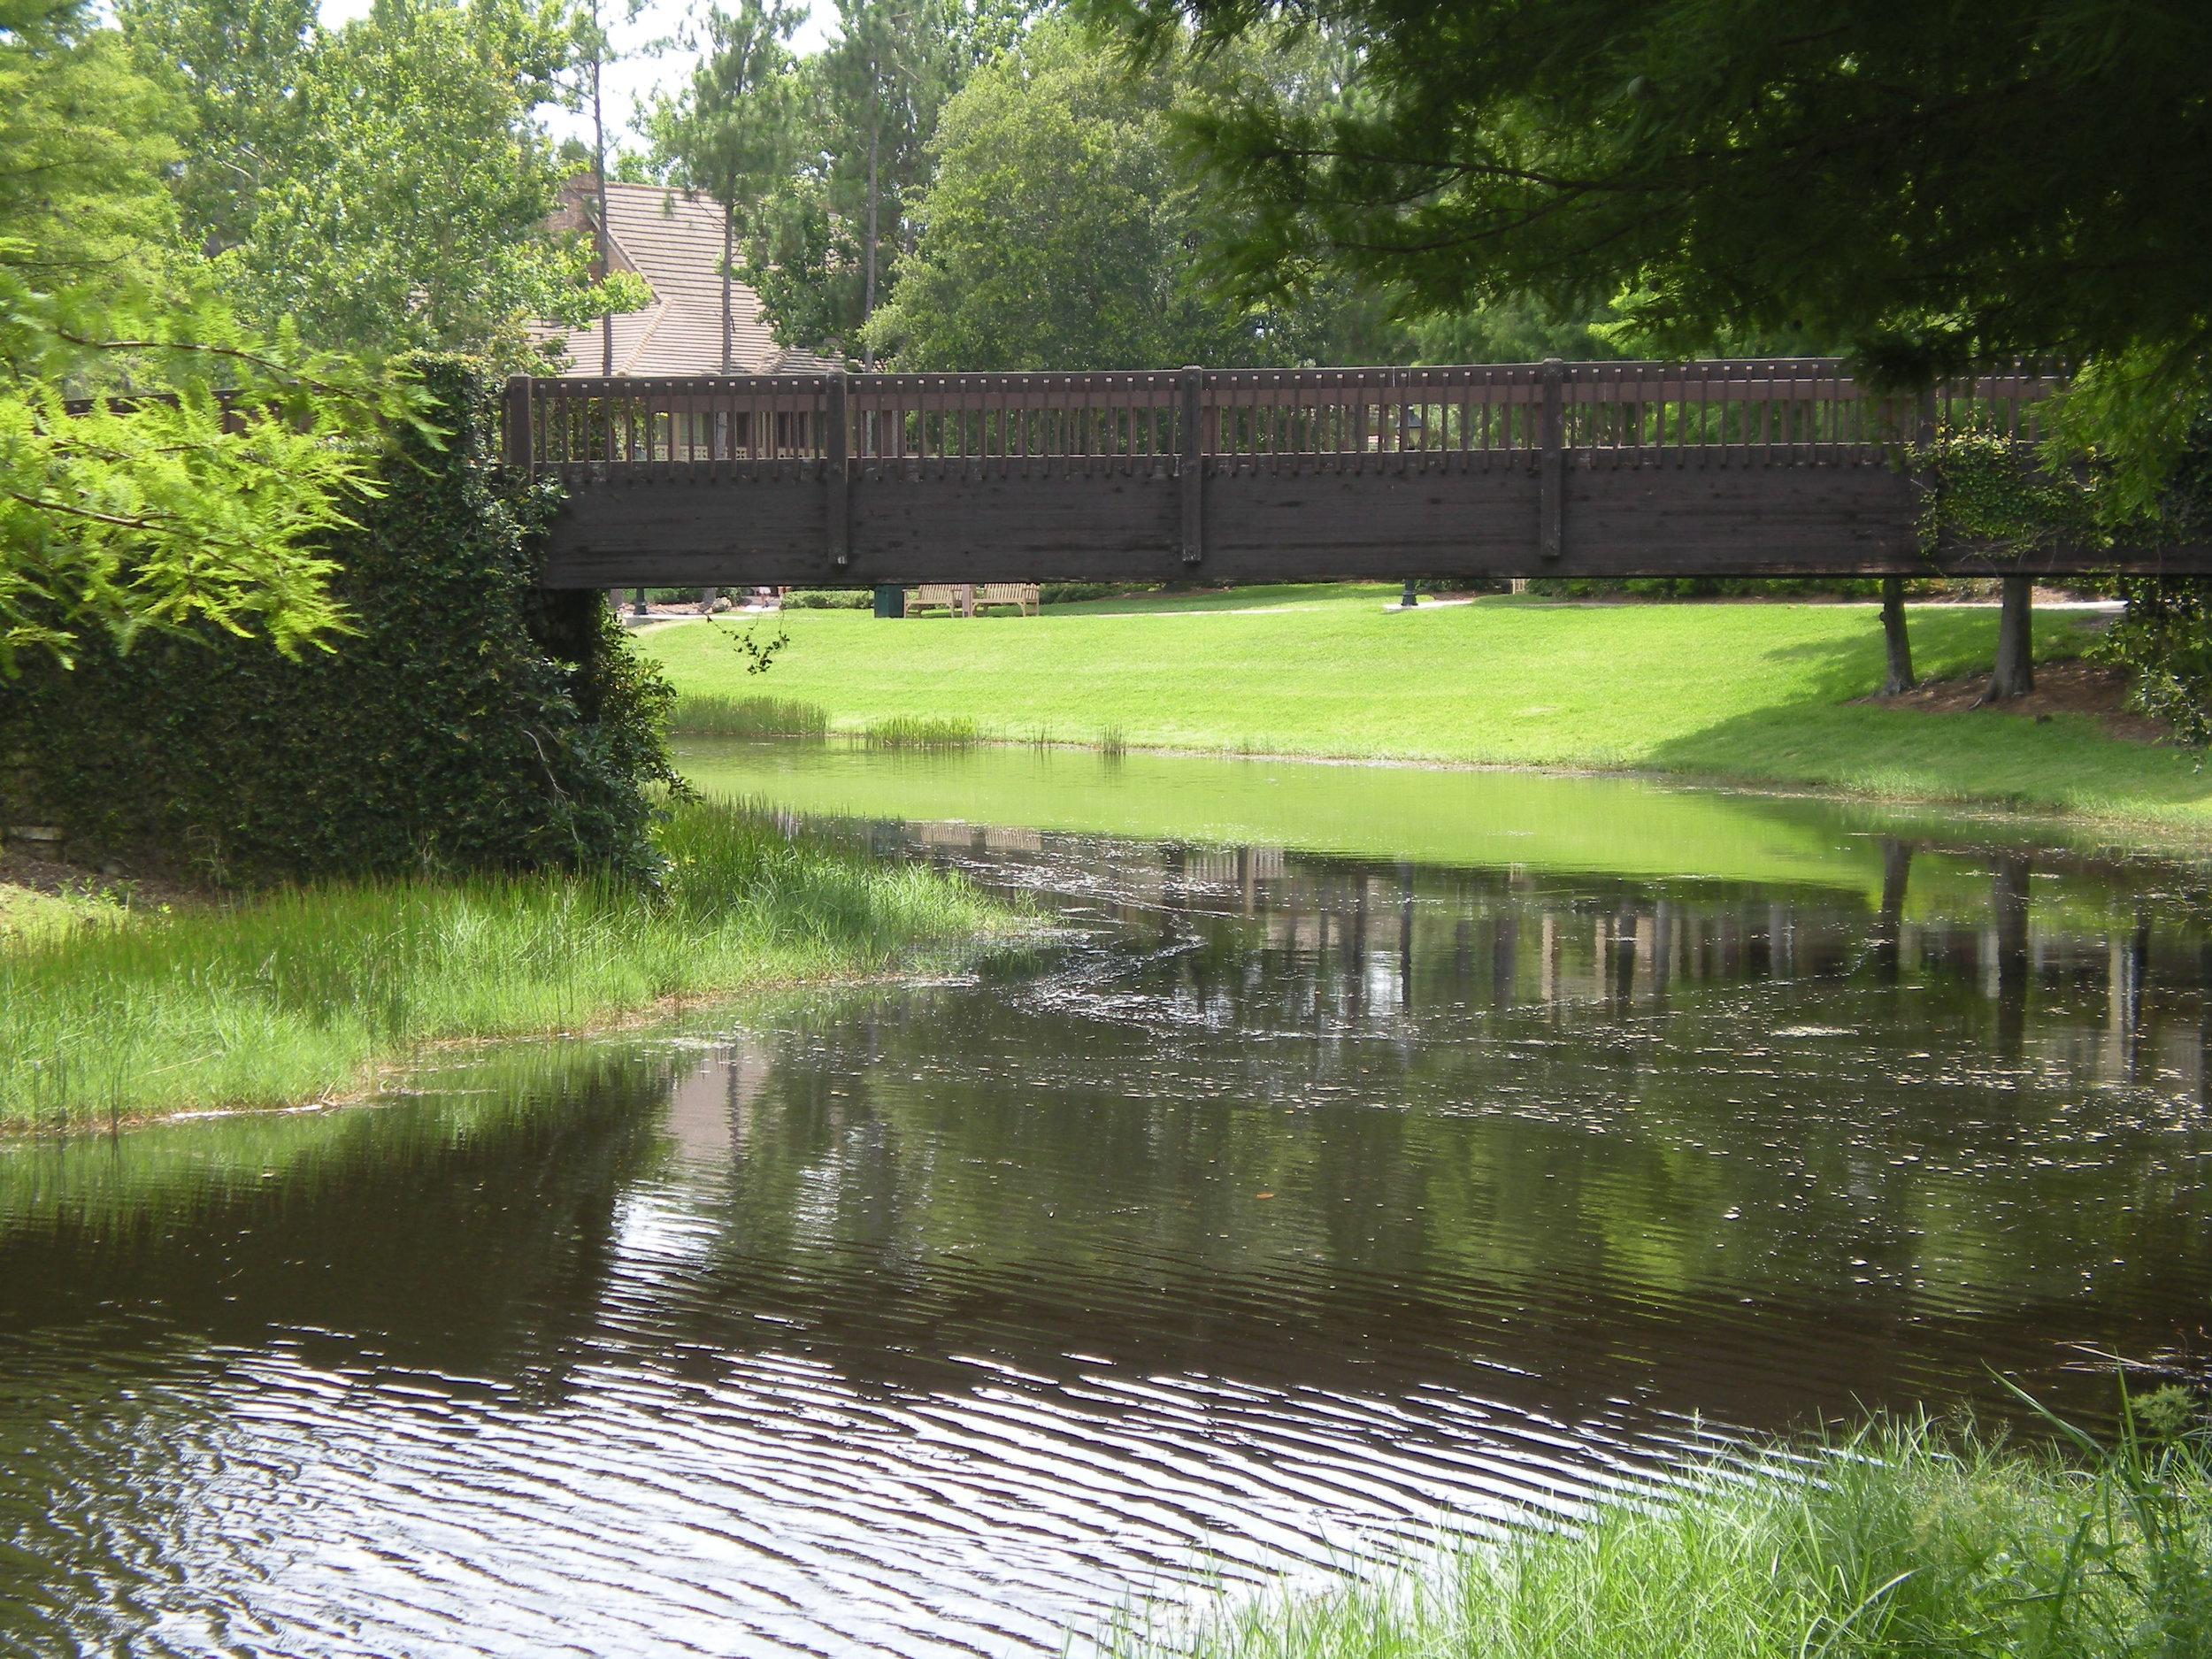 Bridge over Sassagoula River, Port Orleans Riverside, Walt Disney World - Author's collection